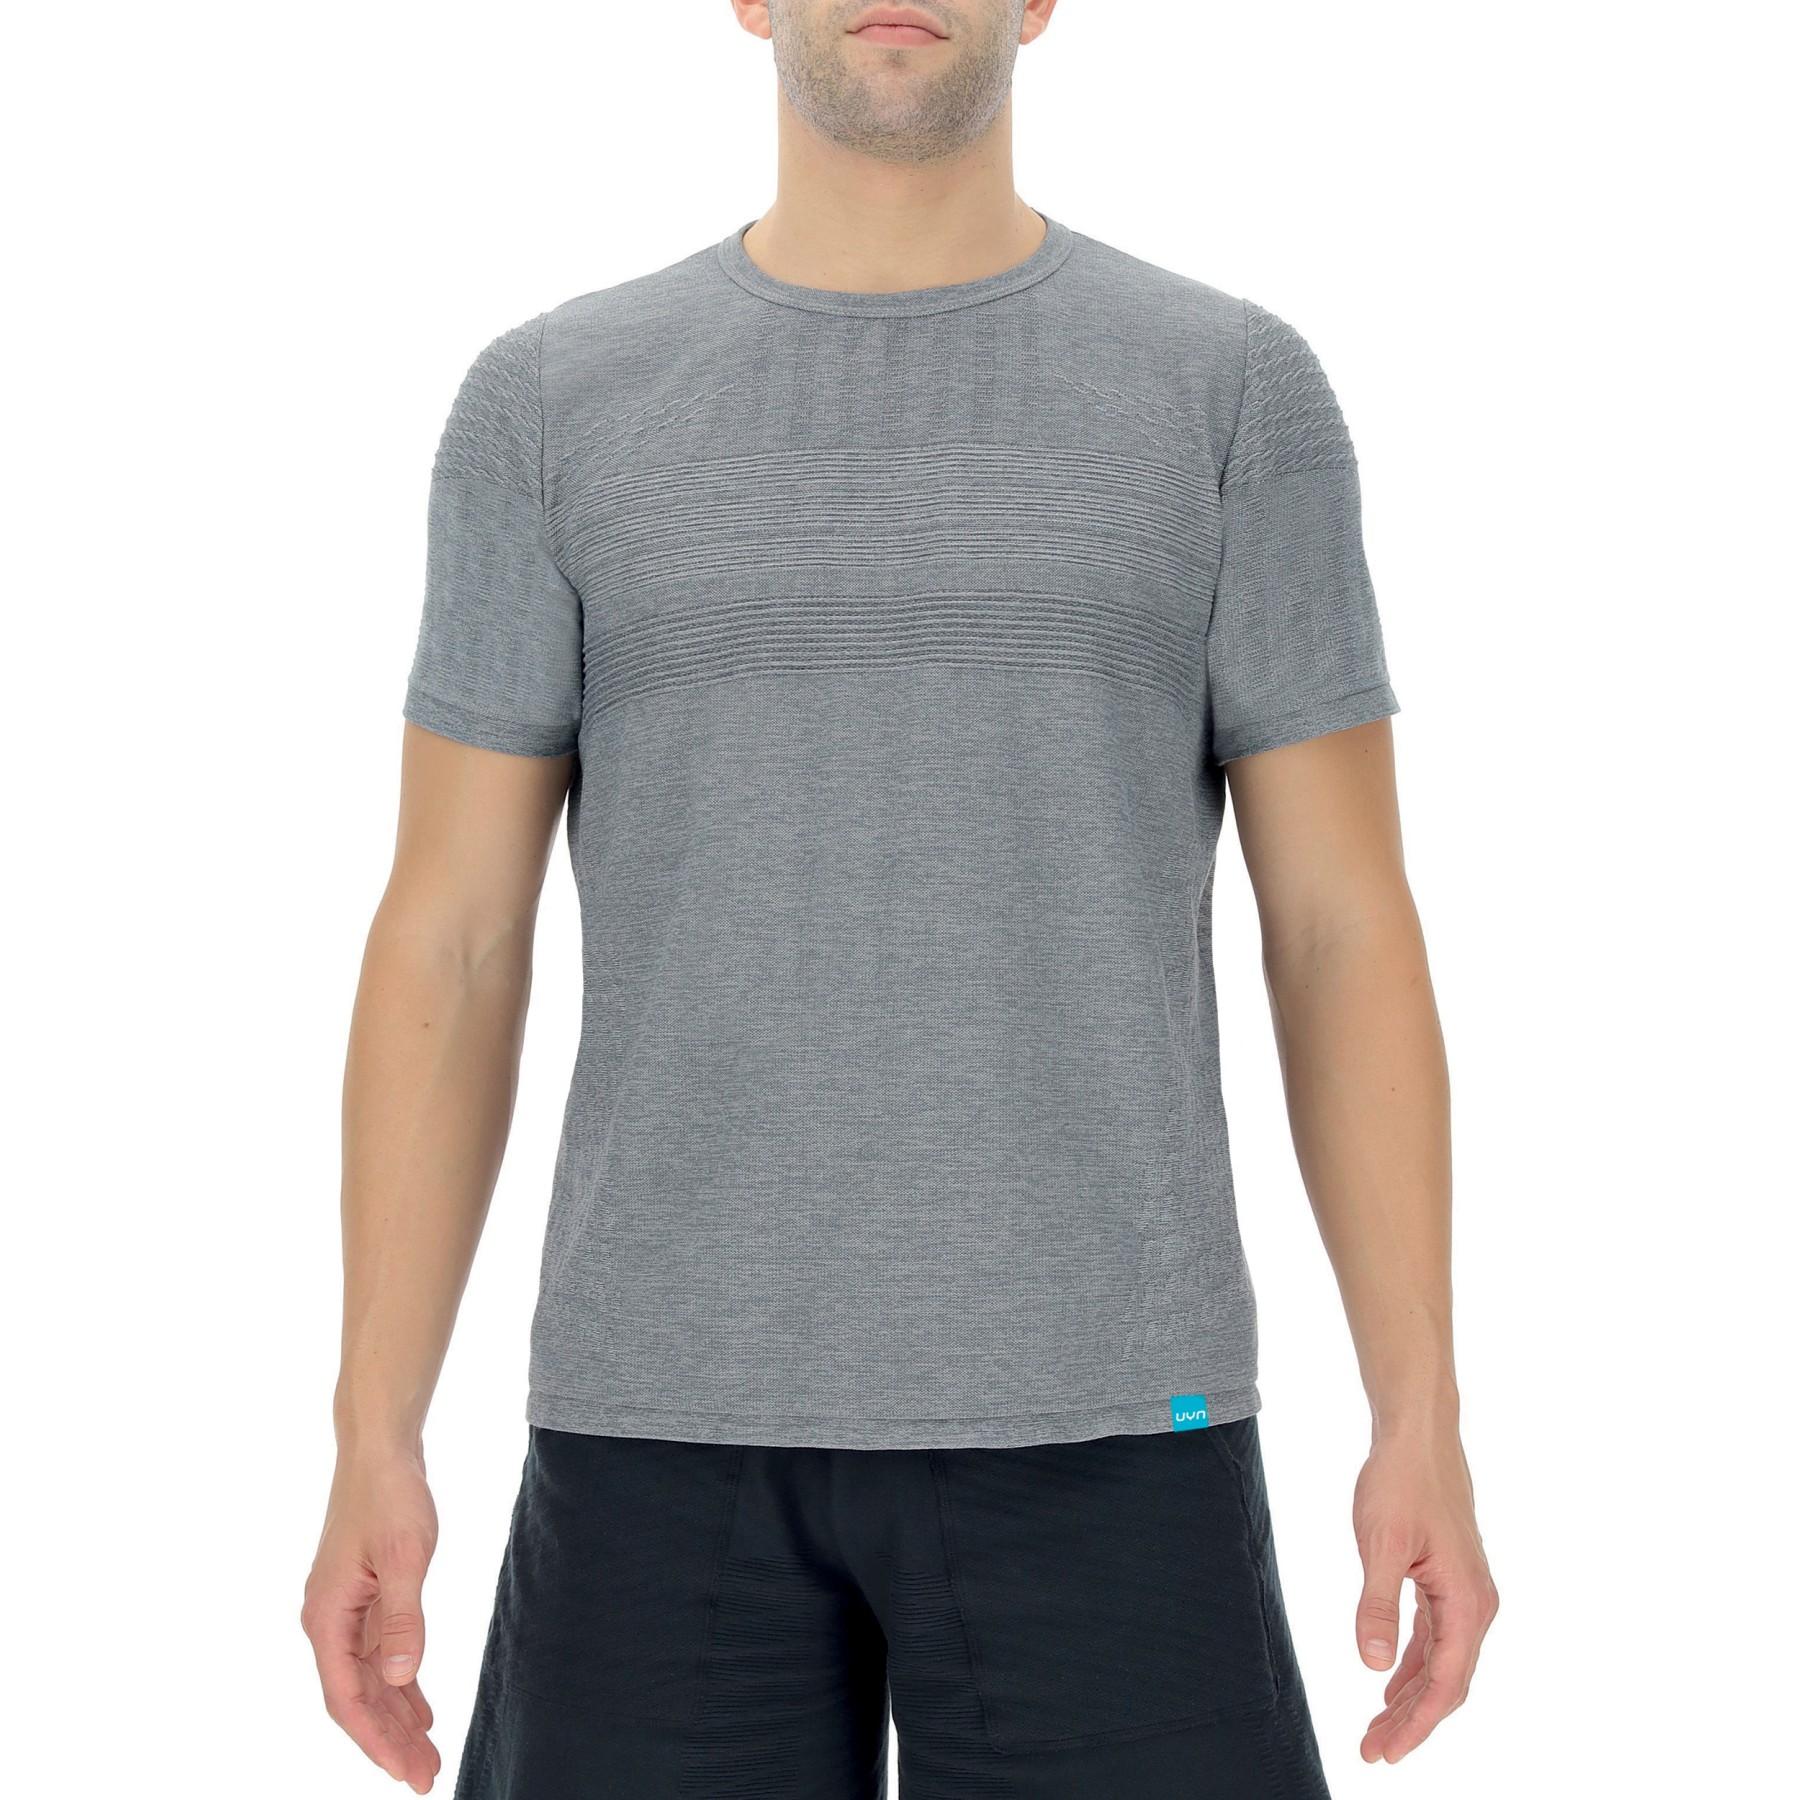 UYN Natural Training T-Shirt - Grey Melange